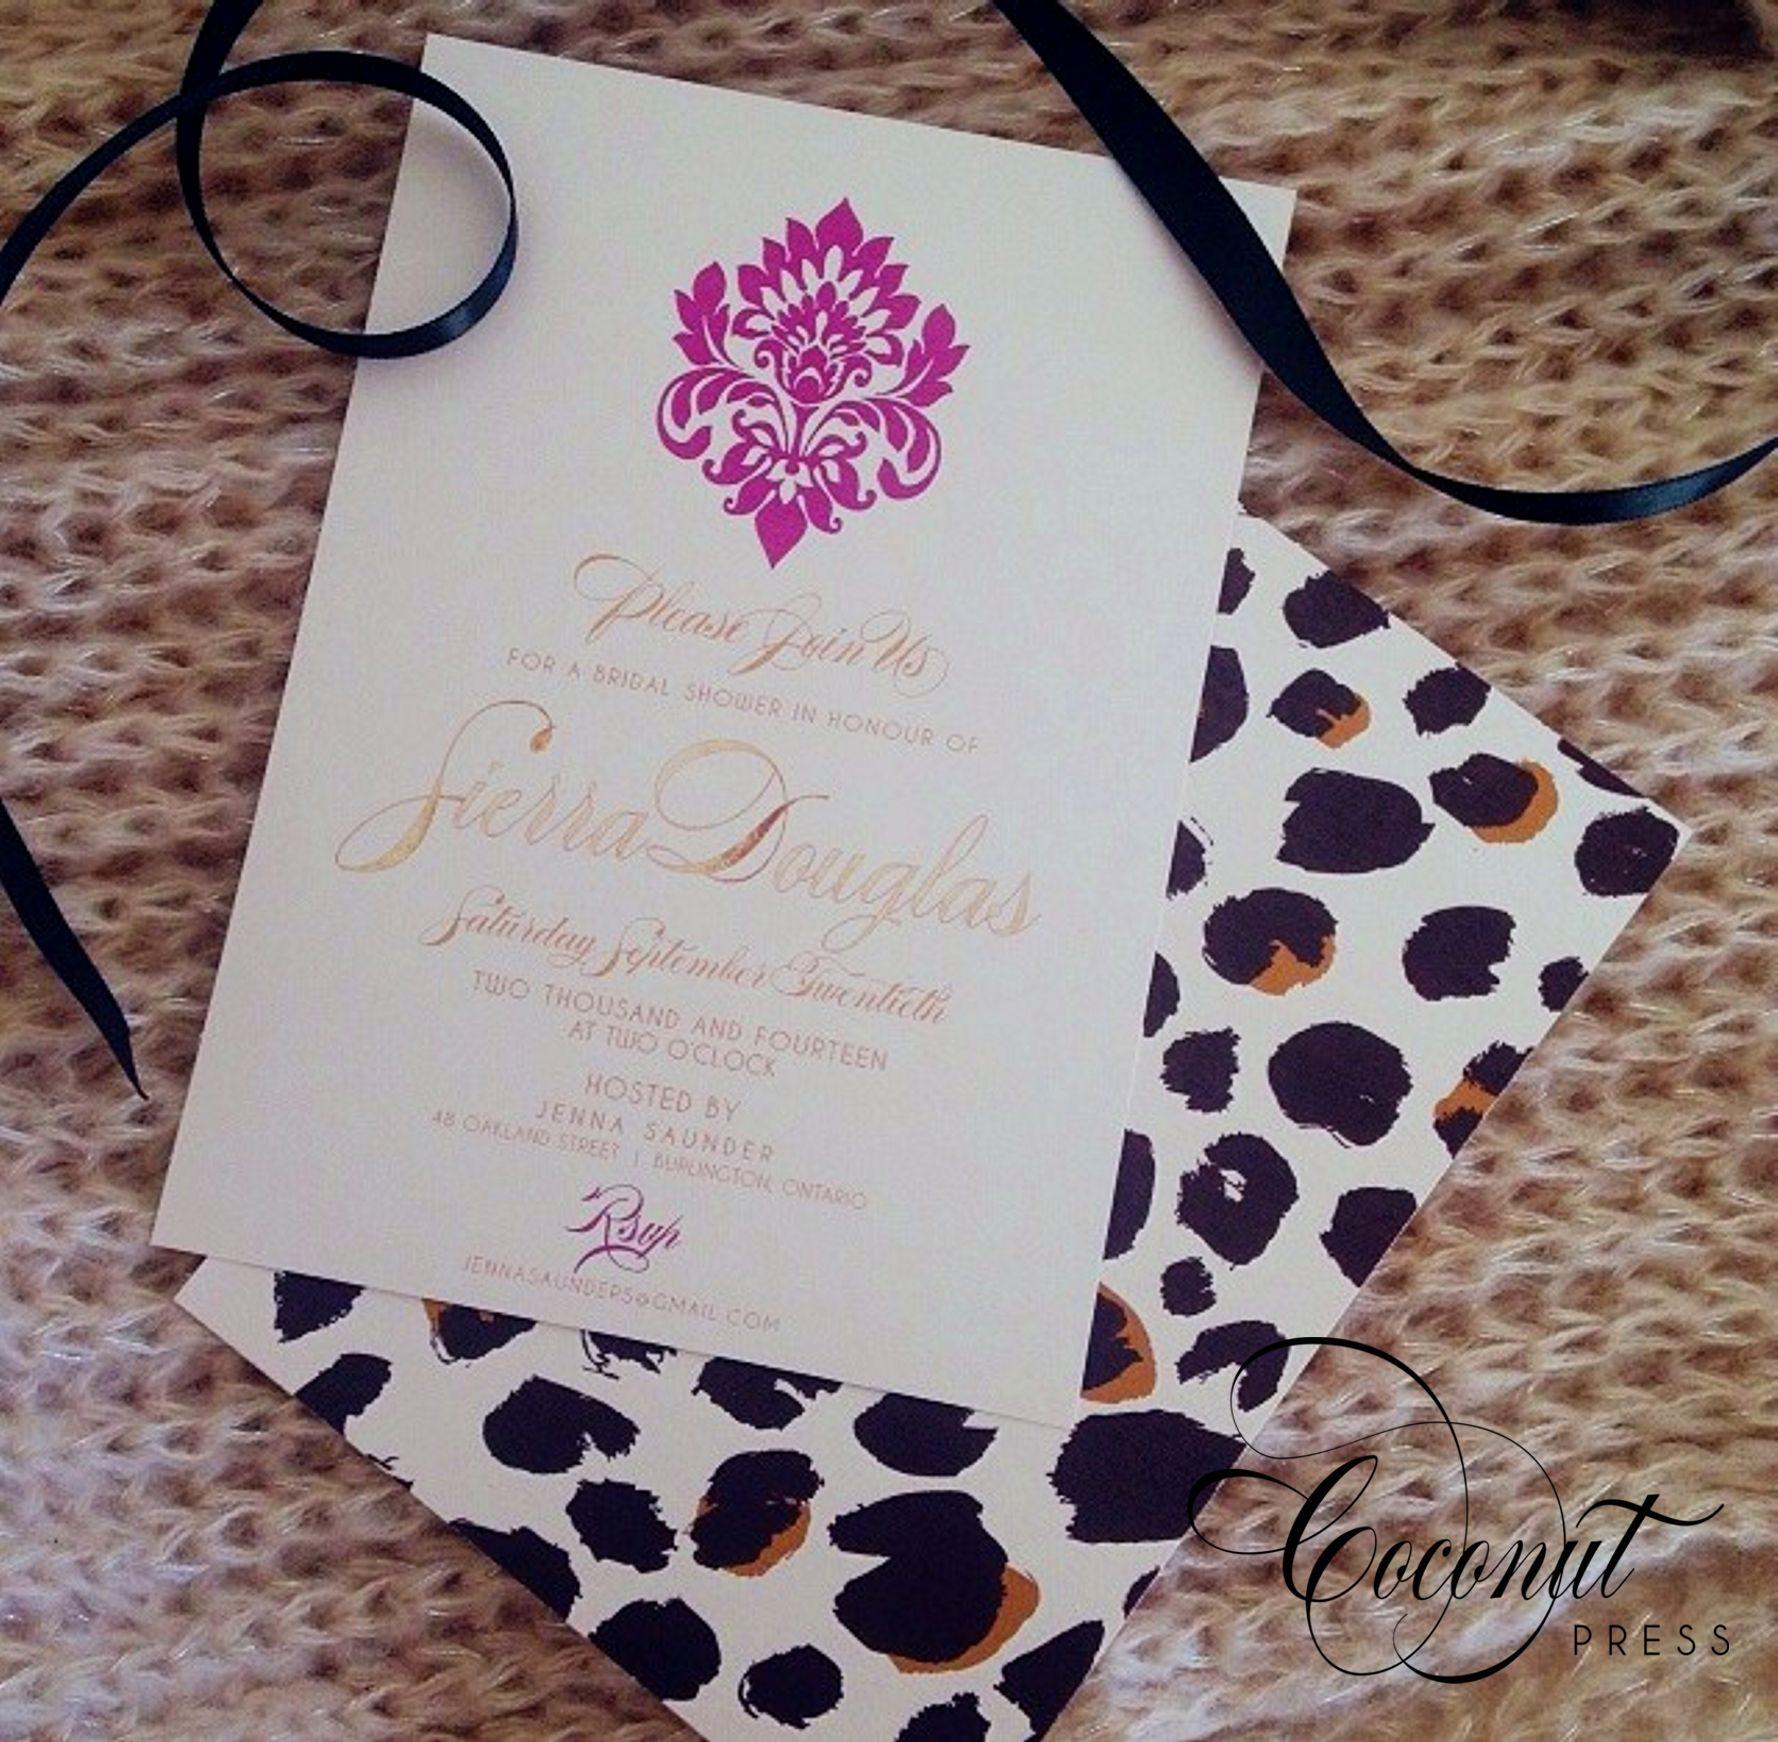 Leopard Print Invitations // Fashion inspired bridal shower ...